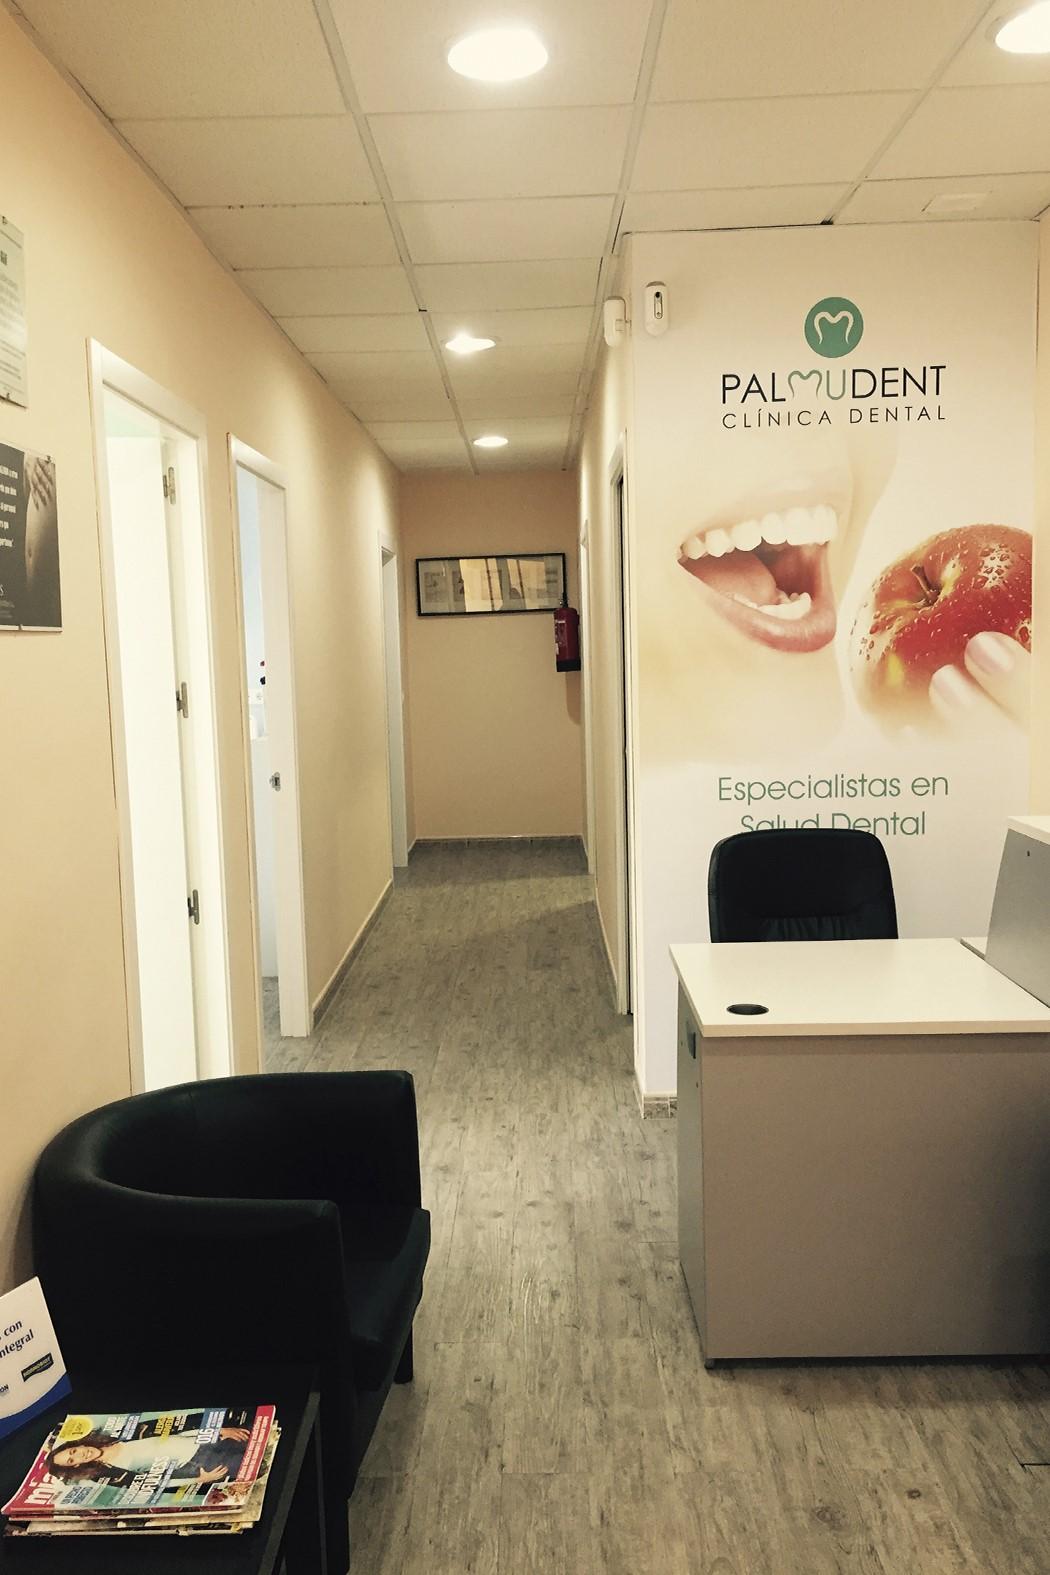 Entrada Clinica dental Granada Palmudent